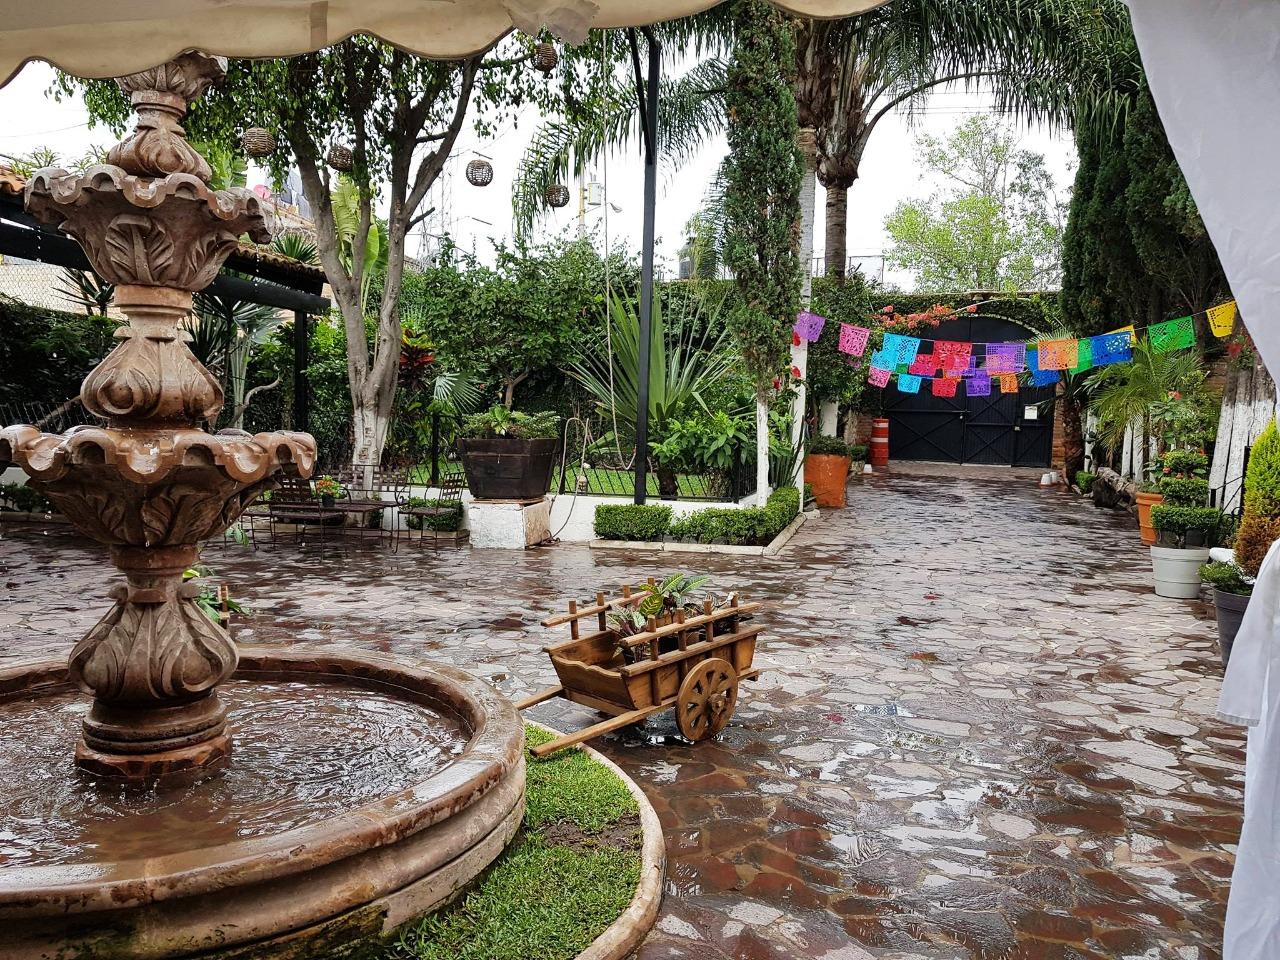 Imagen 5 del espacio Terraza Ayary Eventos en Zapopan, México